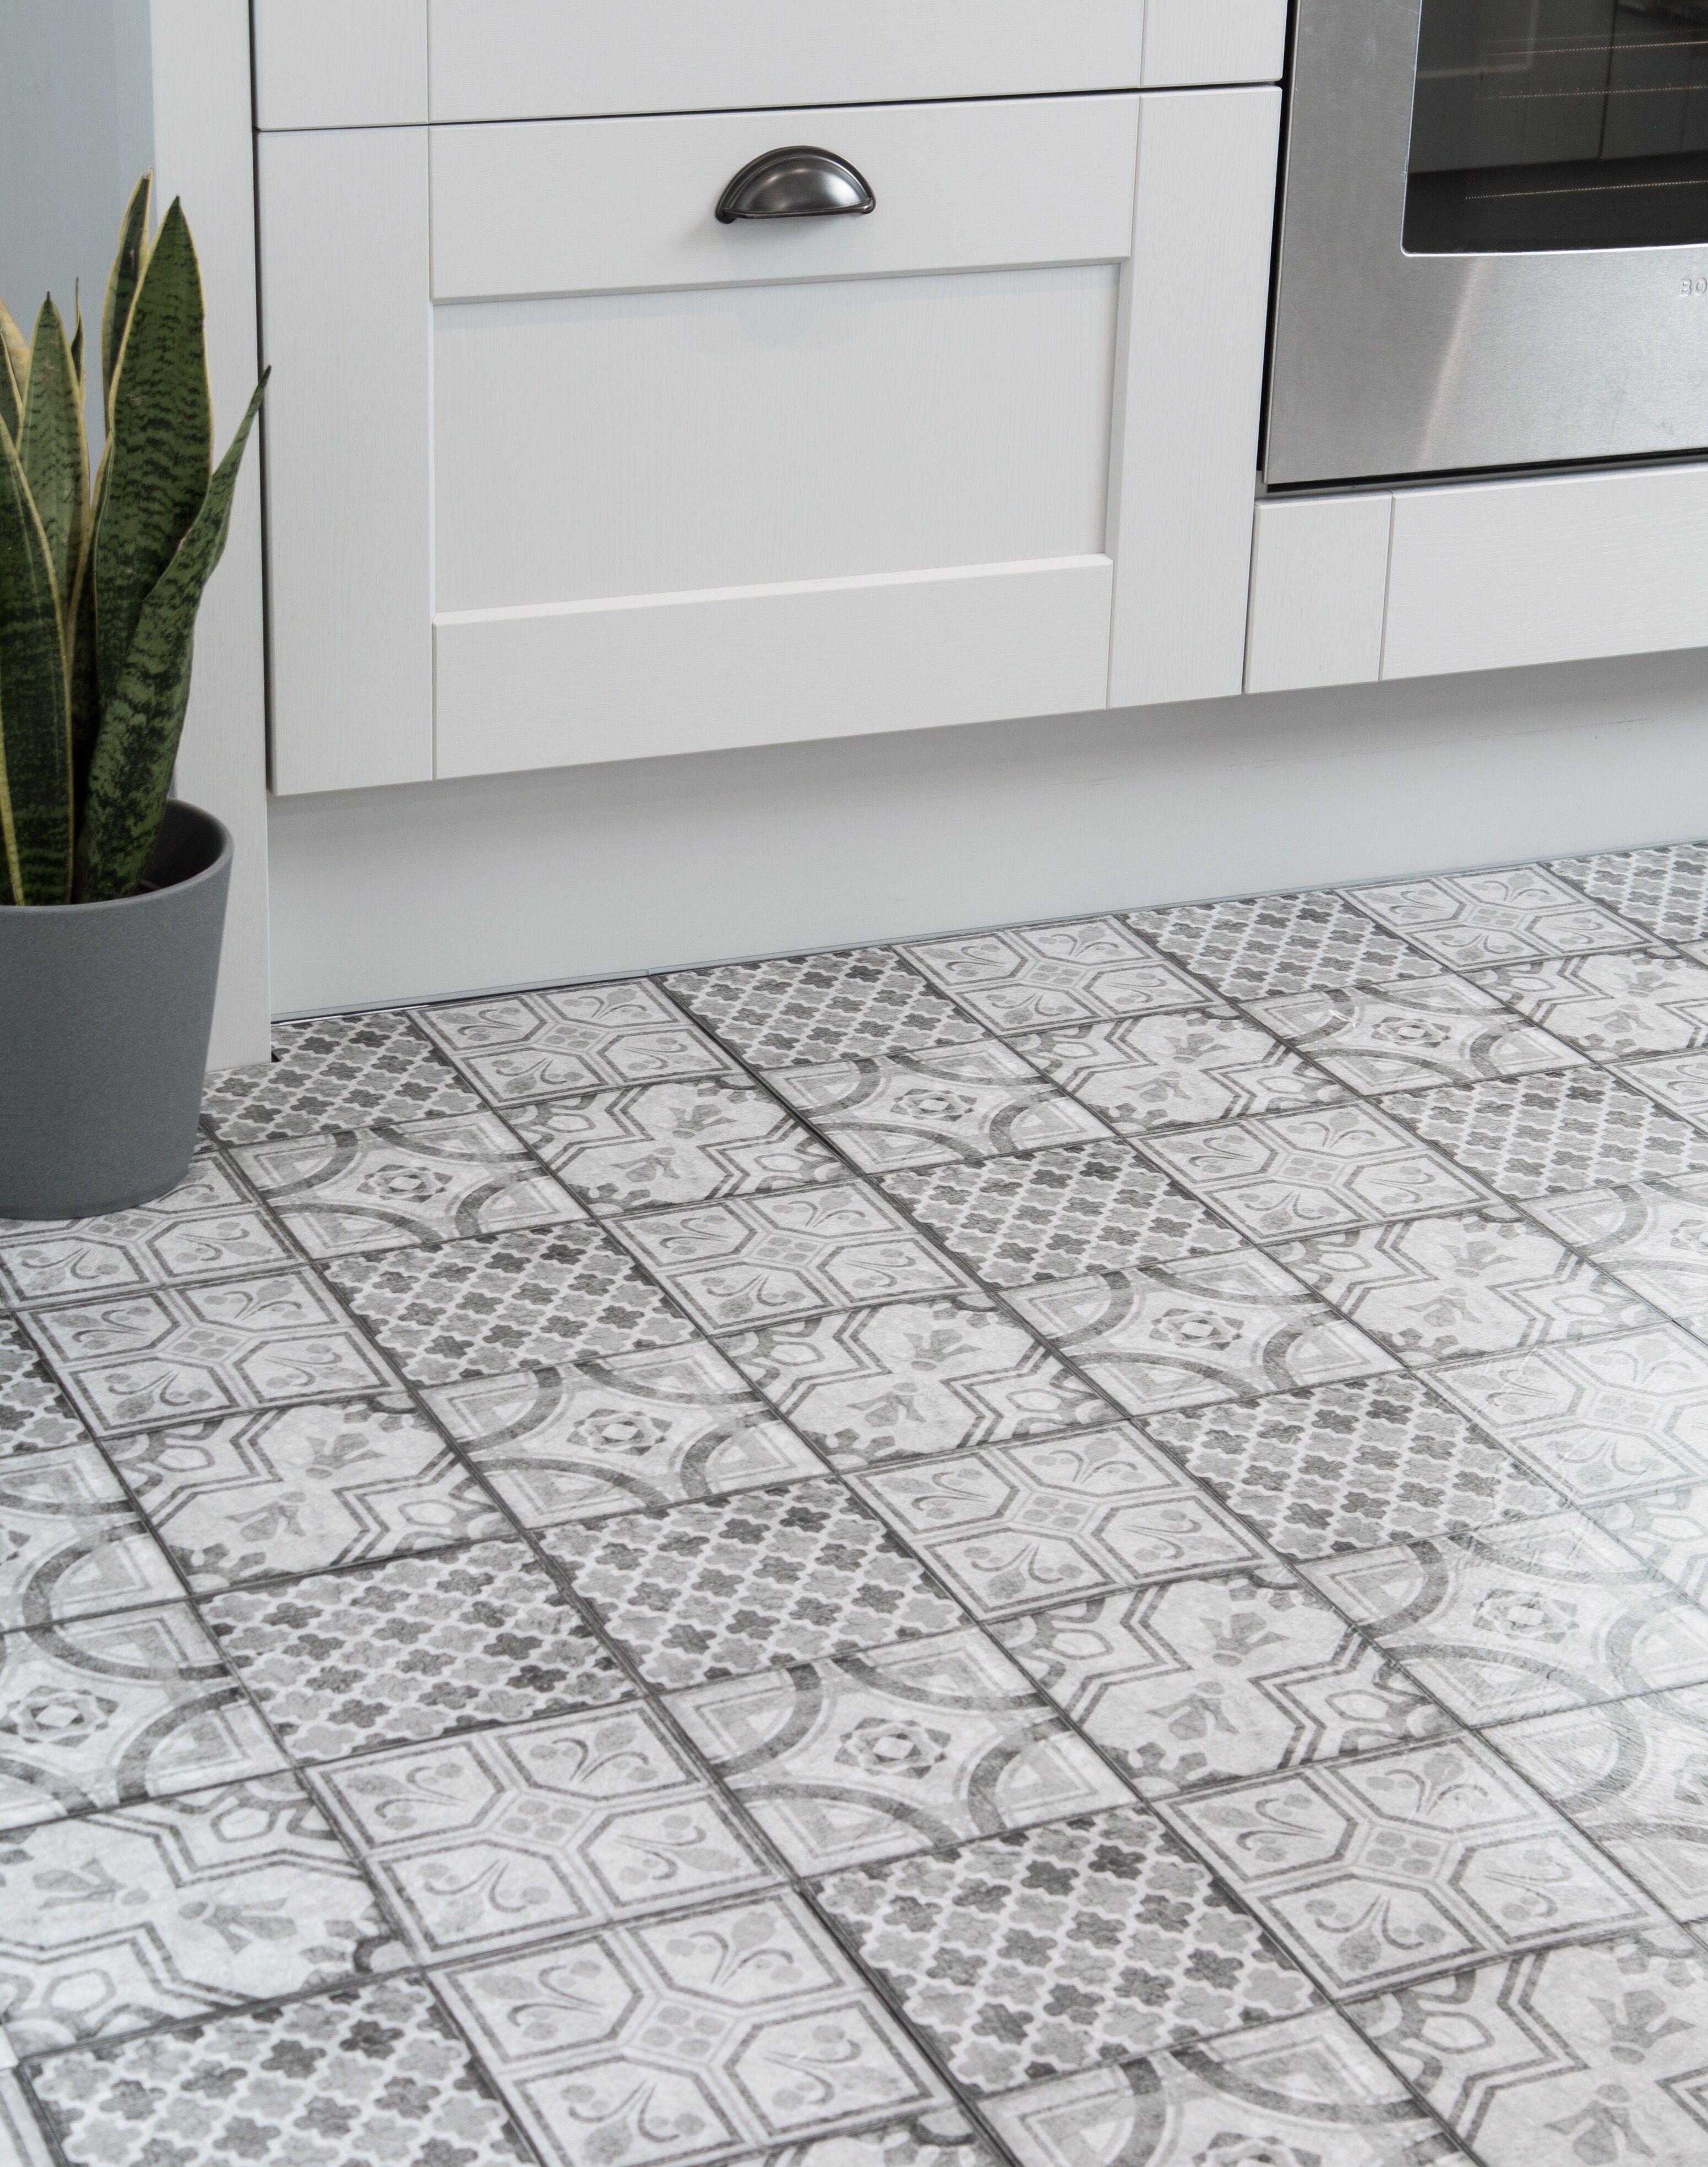 30 5cm X 30 5cm D C Floor Moroccan Grey Self Adhesive Vinyl Floor Tiles 274 5043 Vinyl Flooring Tile Floor Flooring